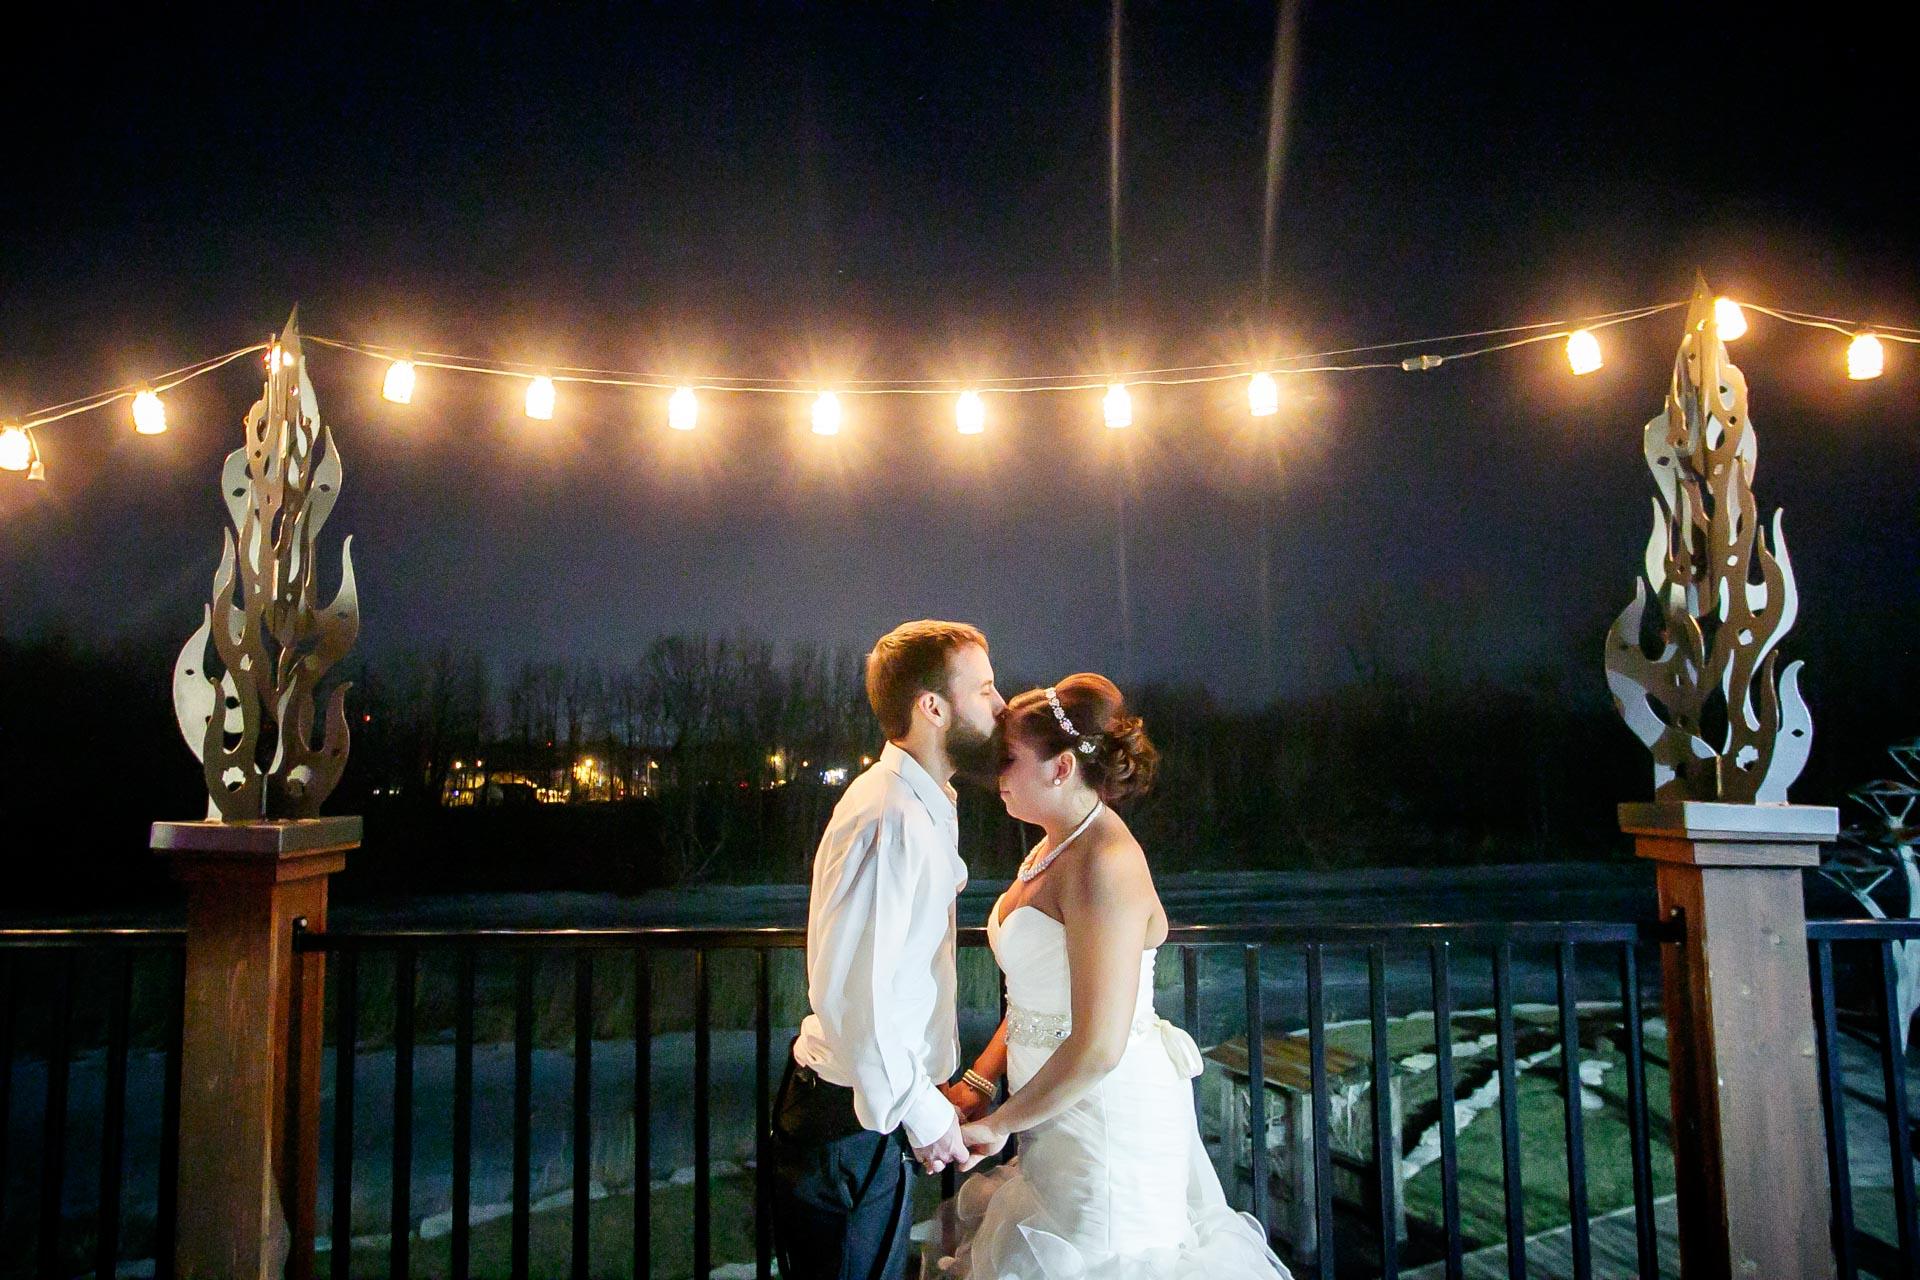 wedding-2-adam-shea-photography-green-bay-appleton-neenah-photographer-16.jpg